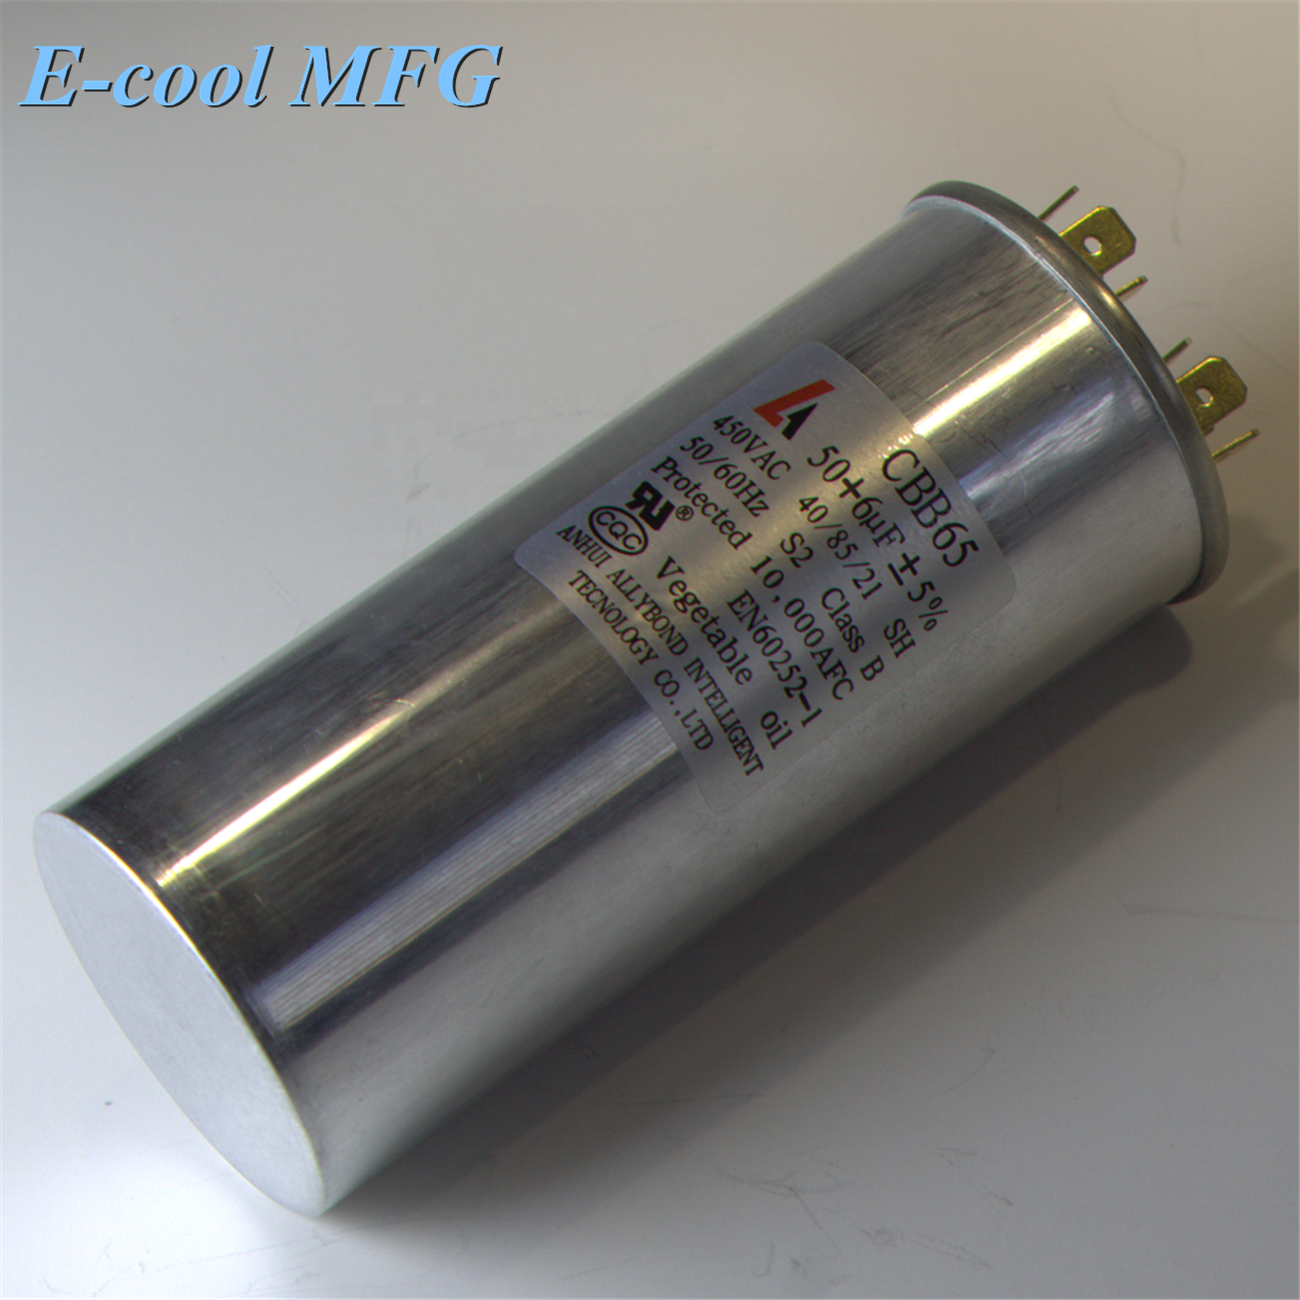 cbb65 capacitor explosion-proof sh p1 p2 50/60hz explosion-proof sh p1 p2 50/60hz